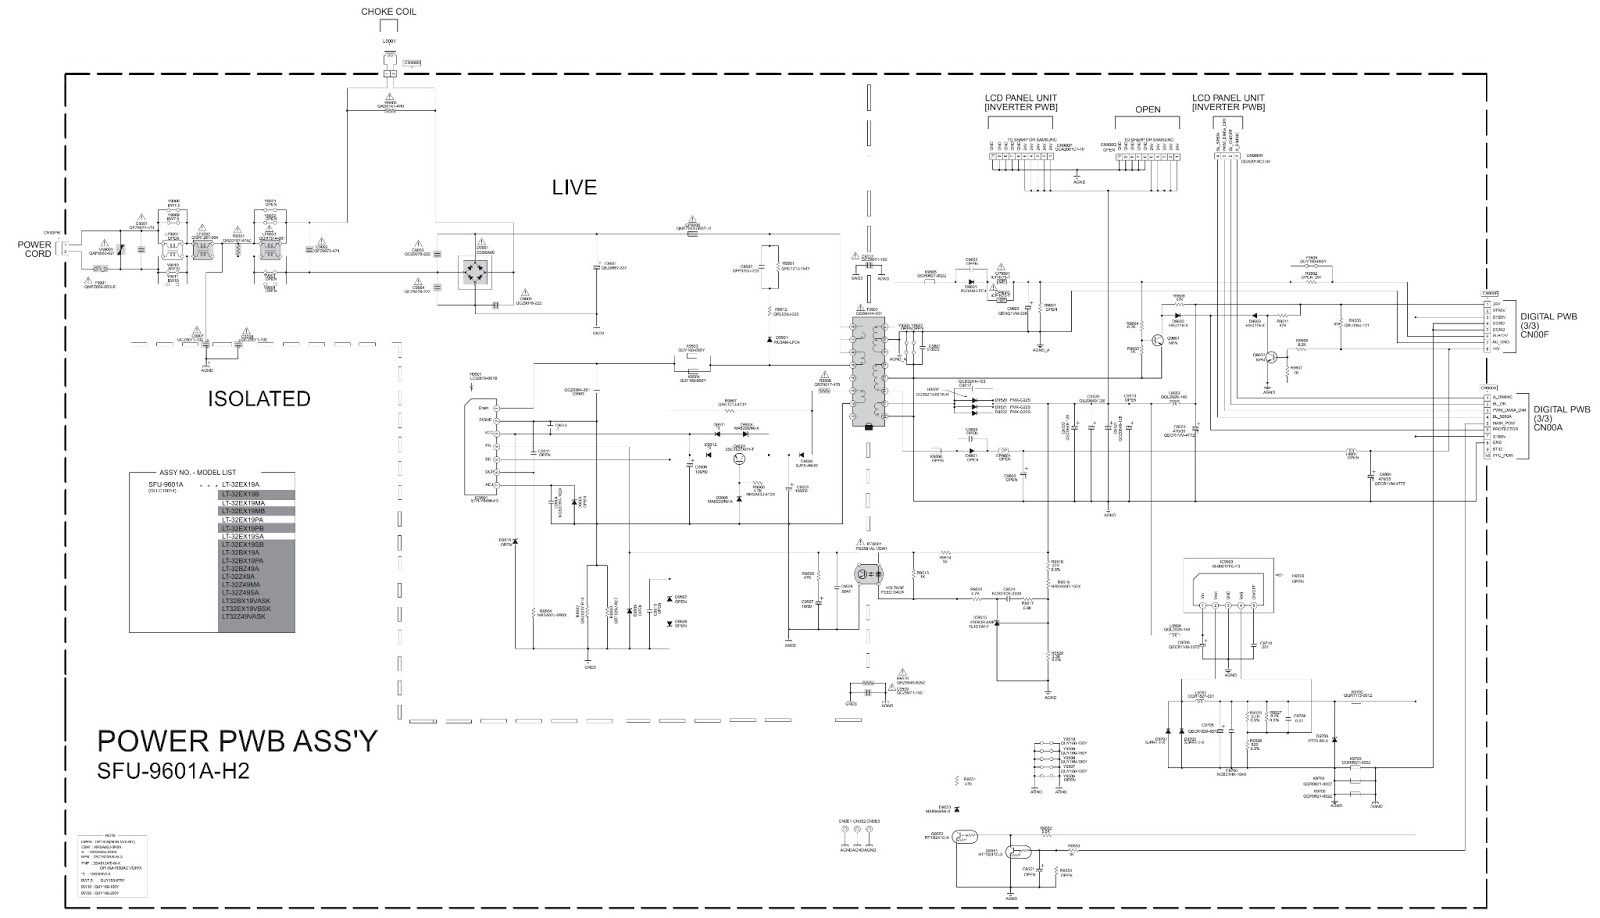 circuit diagram jvc tv wiring diagram name circuit diagram jvc tv [ 1600 x 918 Pixel ]